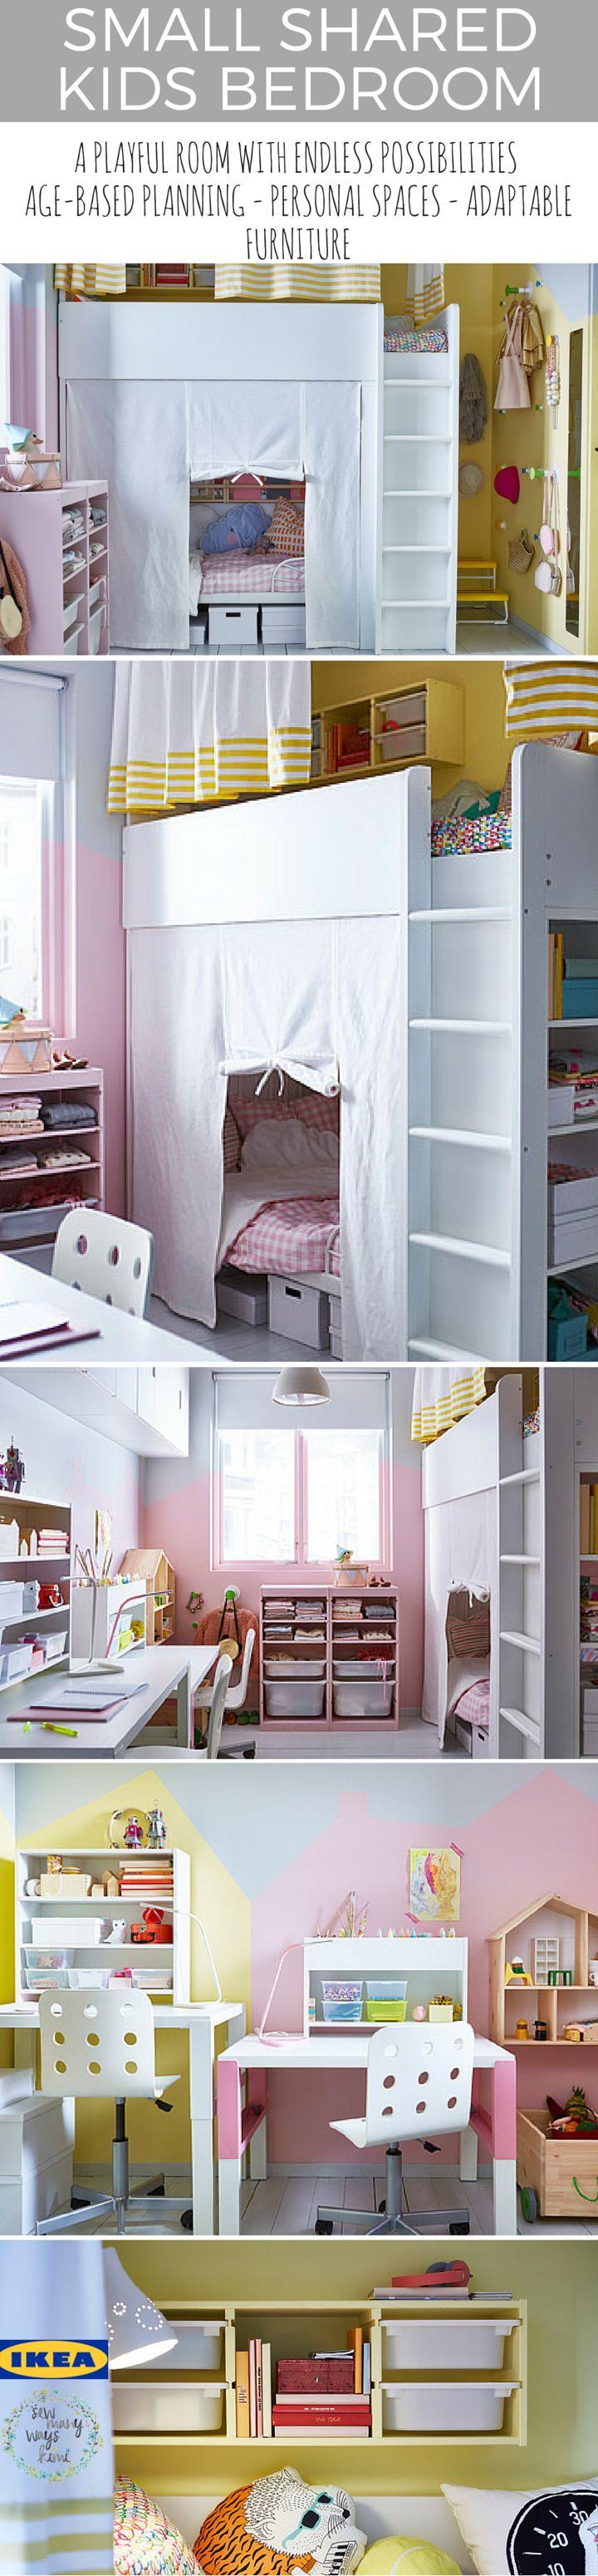 25 Best Ideas About Ikea Girls Room On Pinterest Ikea Kids Room Girls Bedroom Ideas Ikea And Kids Room Shelves